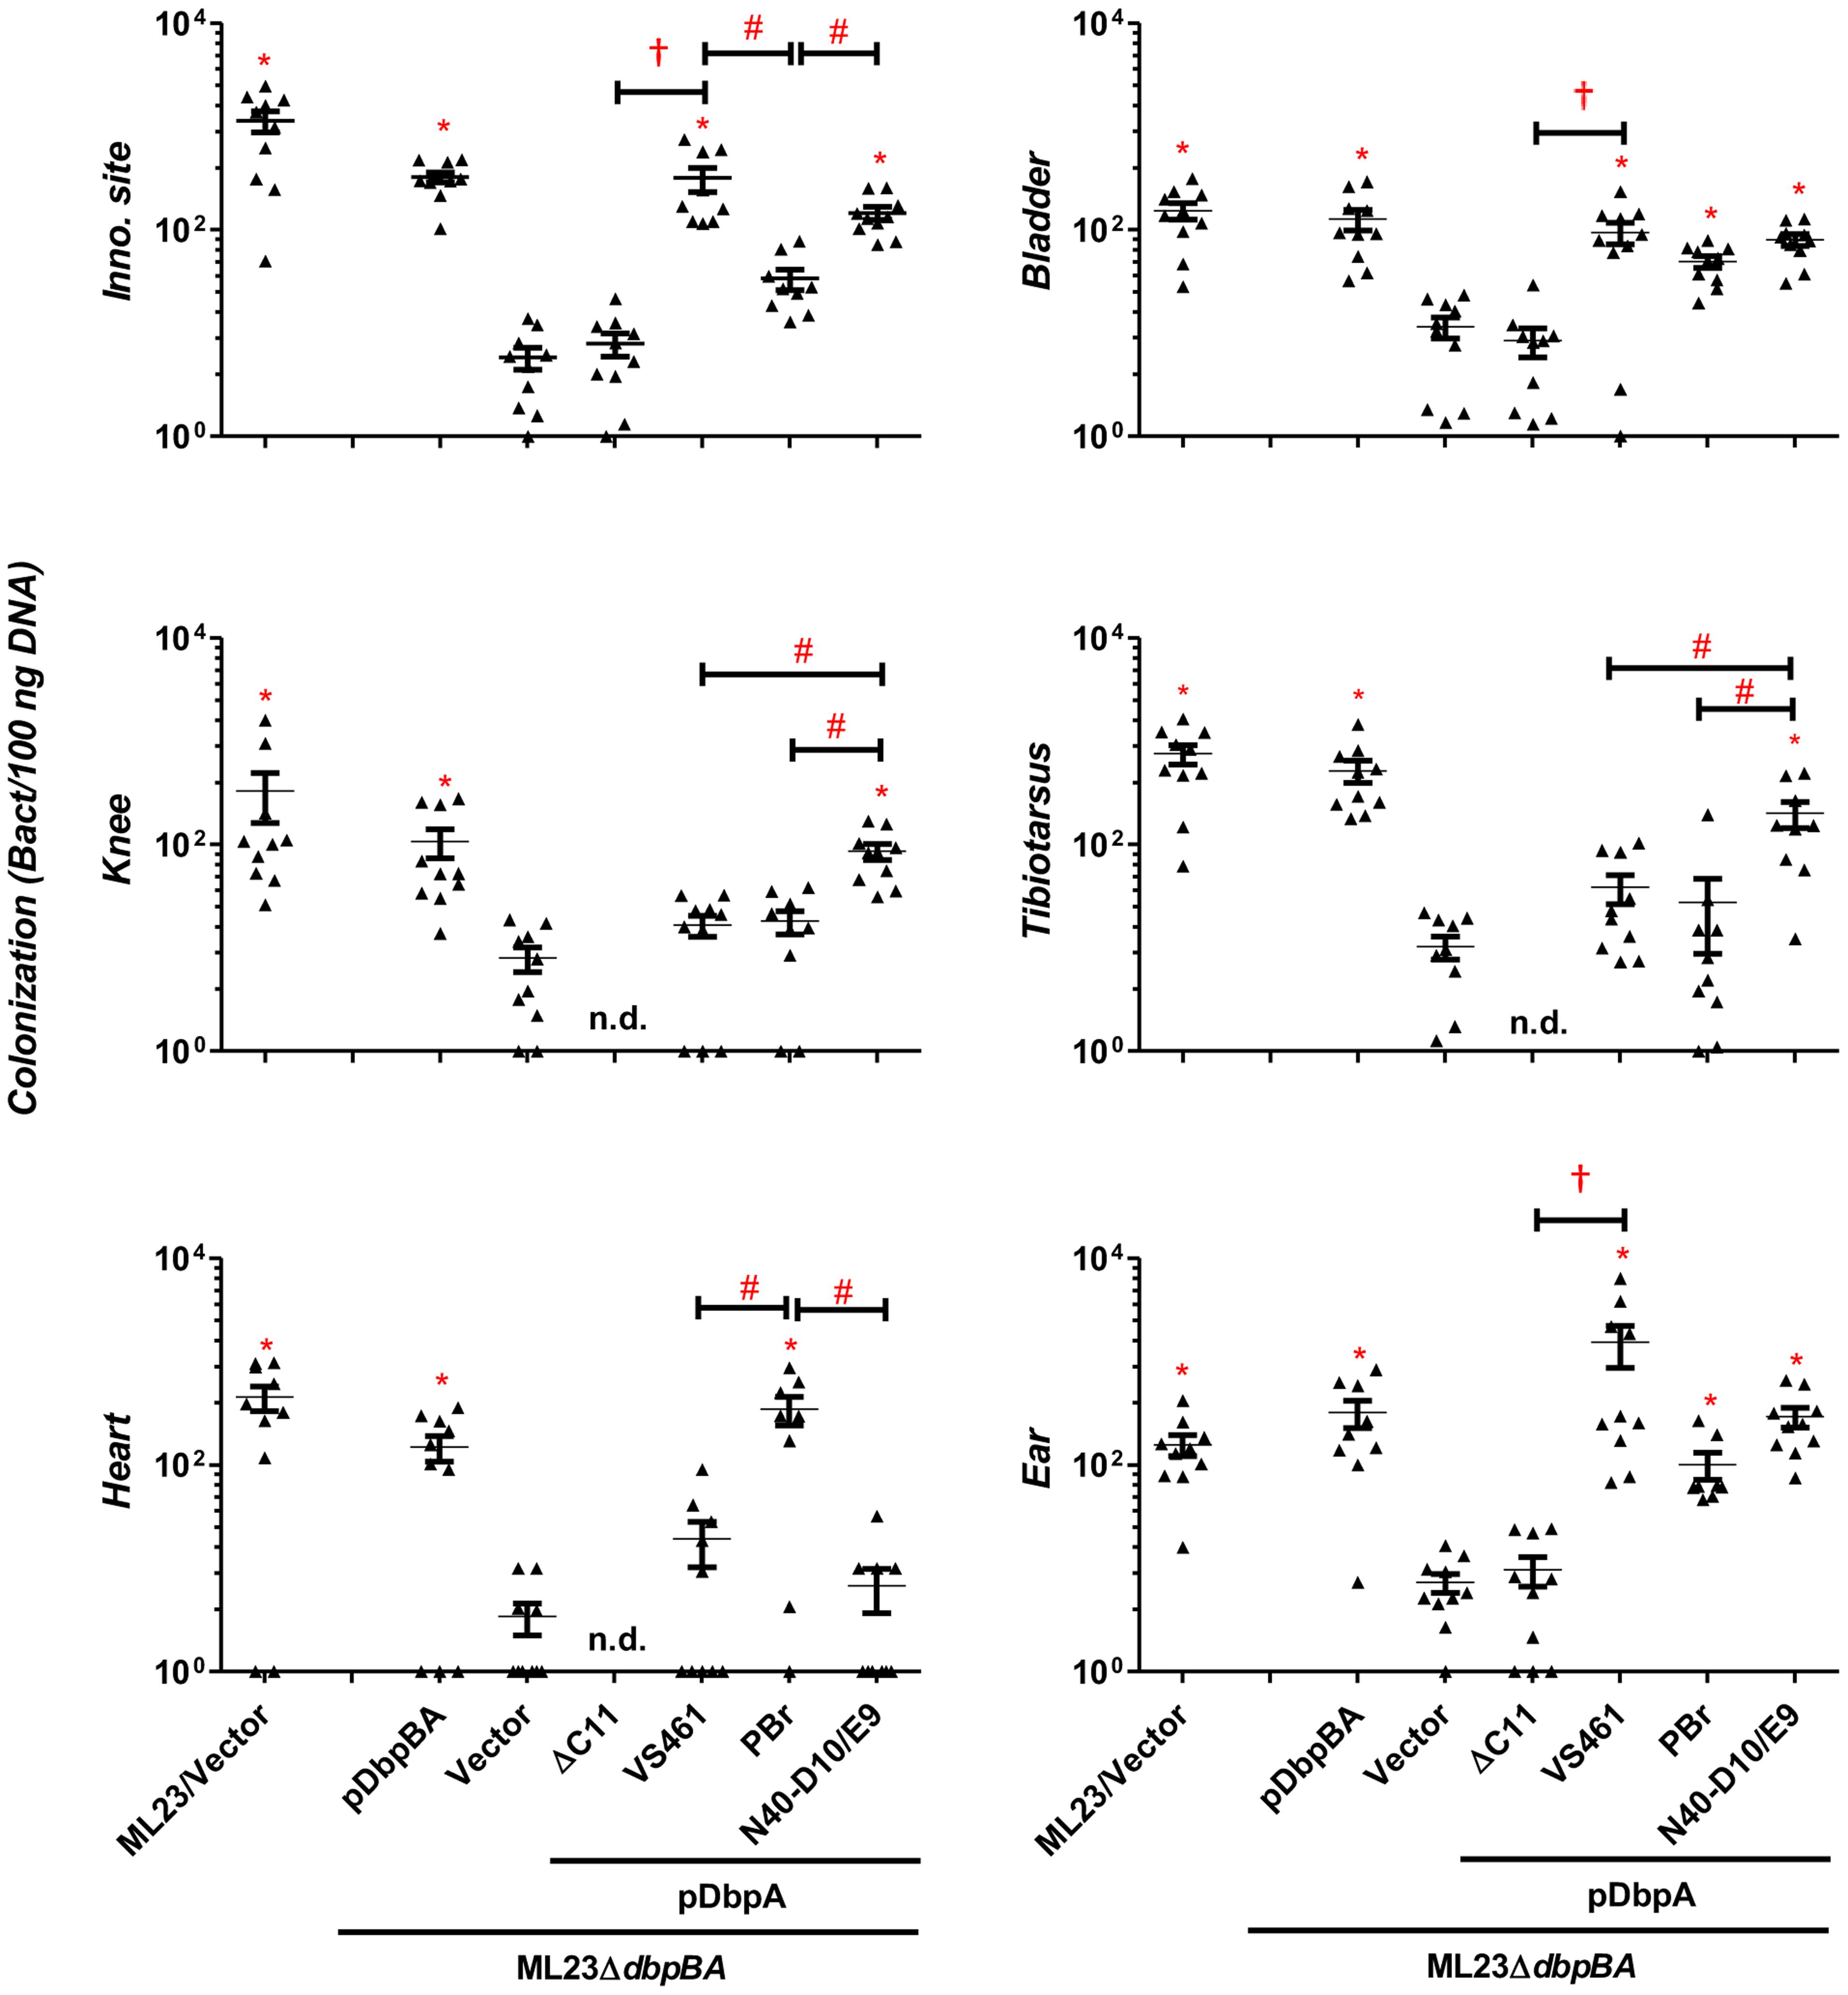 DbpA variants promote distinct <i>B. burgdorferi</i> tissue colonization profiles at 28 days post-infection.